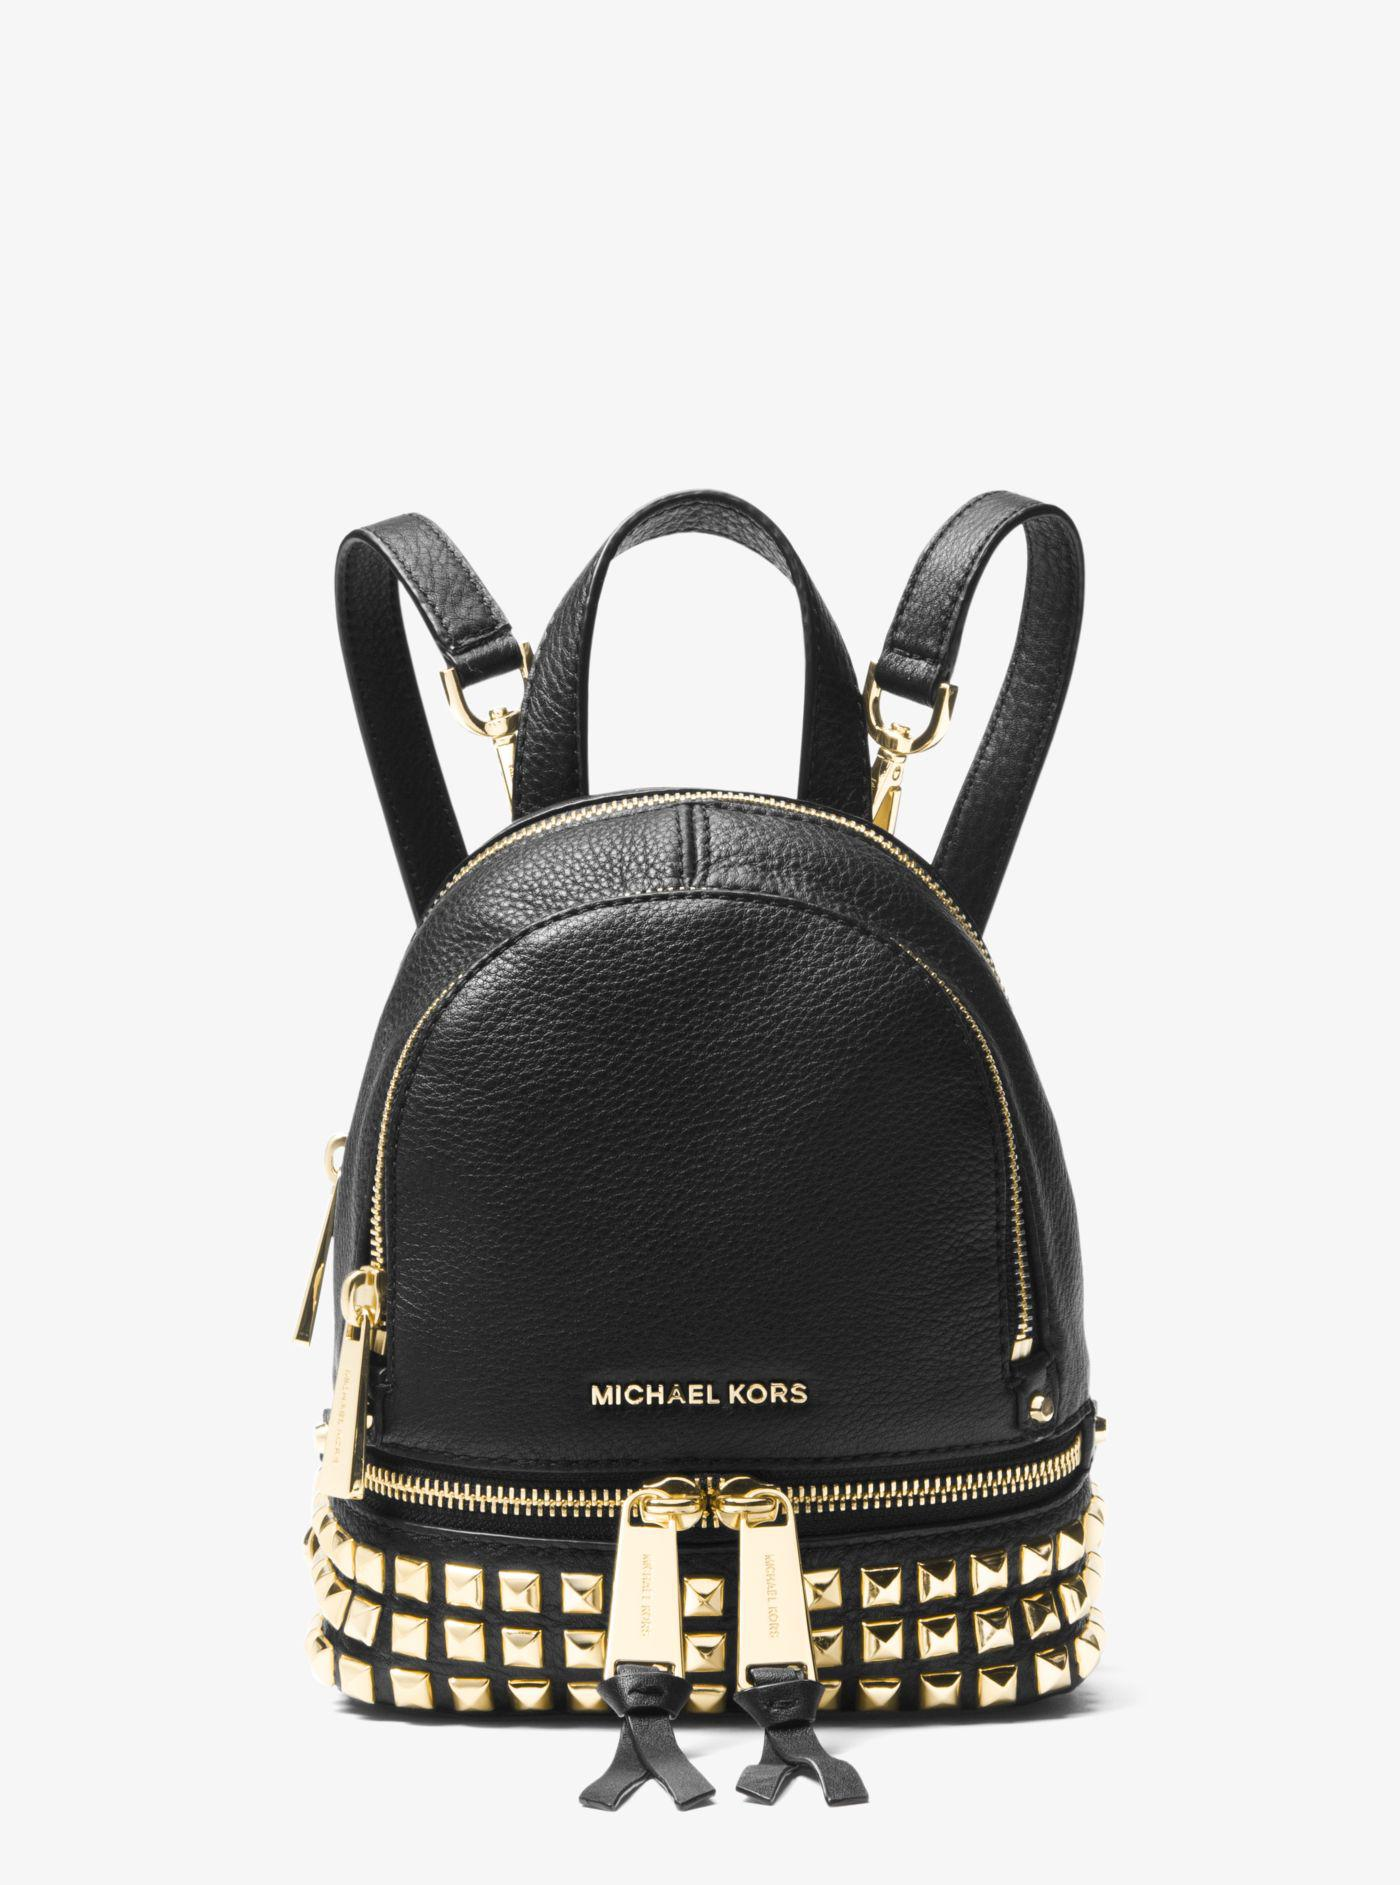 9067ed42a4b6 ... real michael kors black rhea mini studded leather backpack lyst. view  fullscreen 844ec 0c5a7